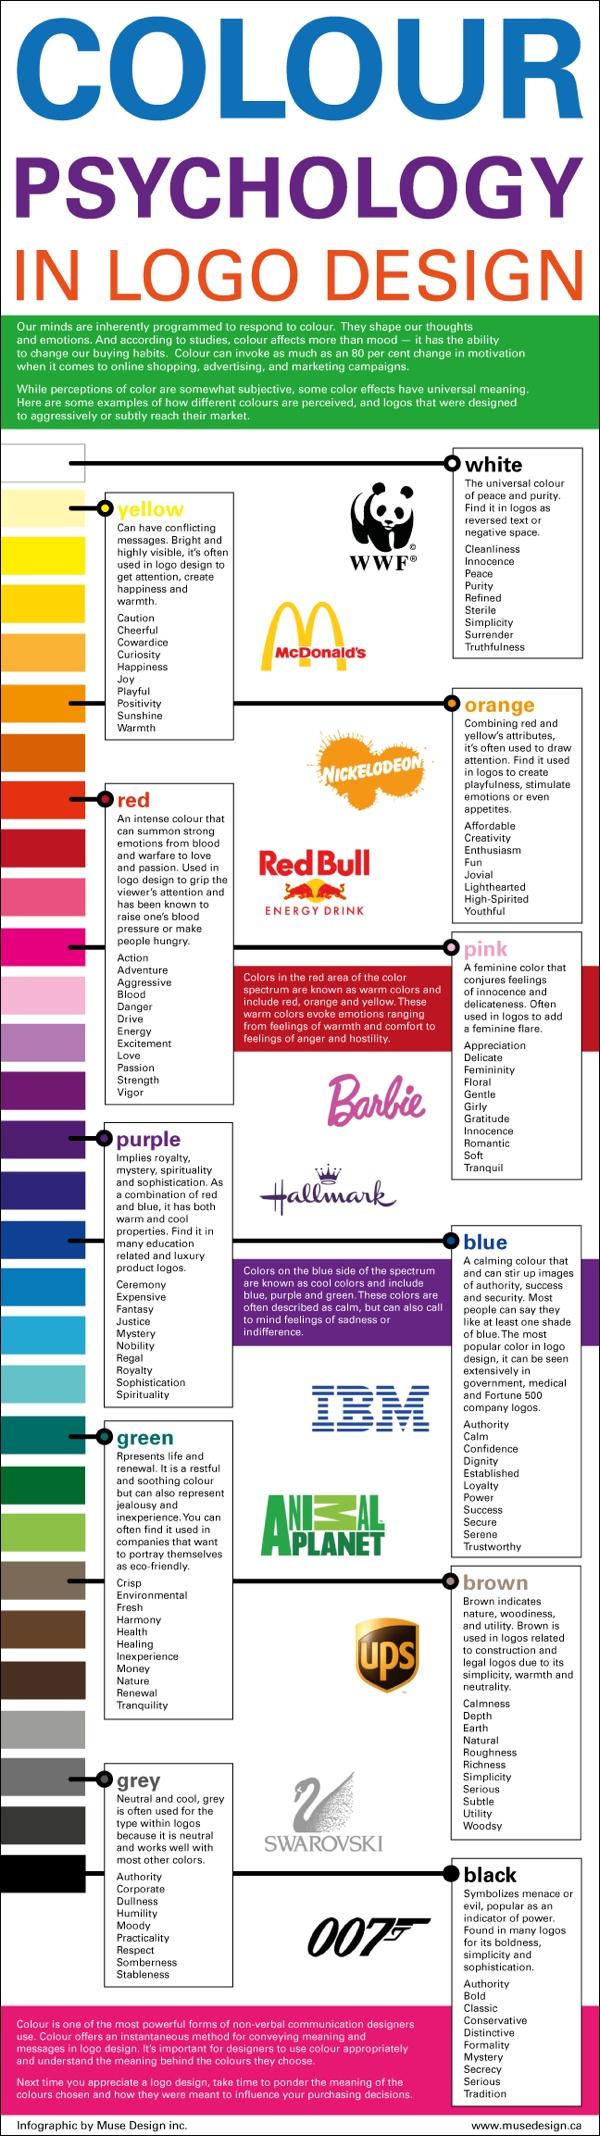 Loghi e colori.